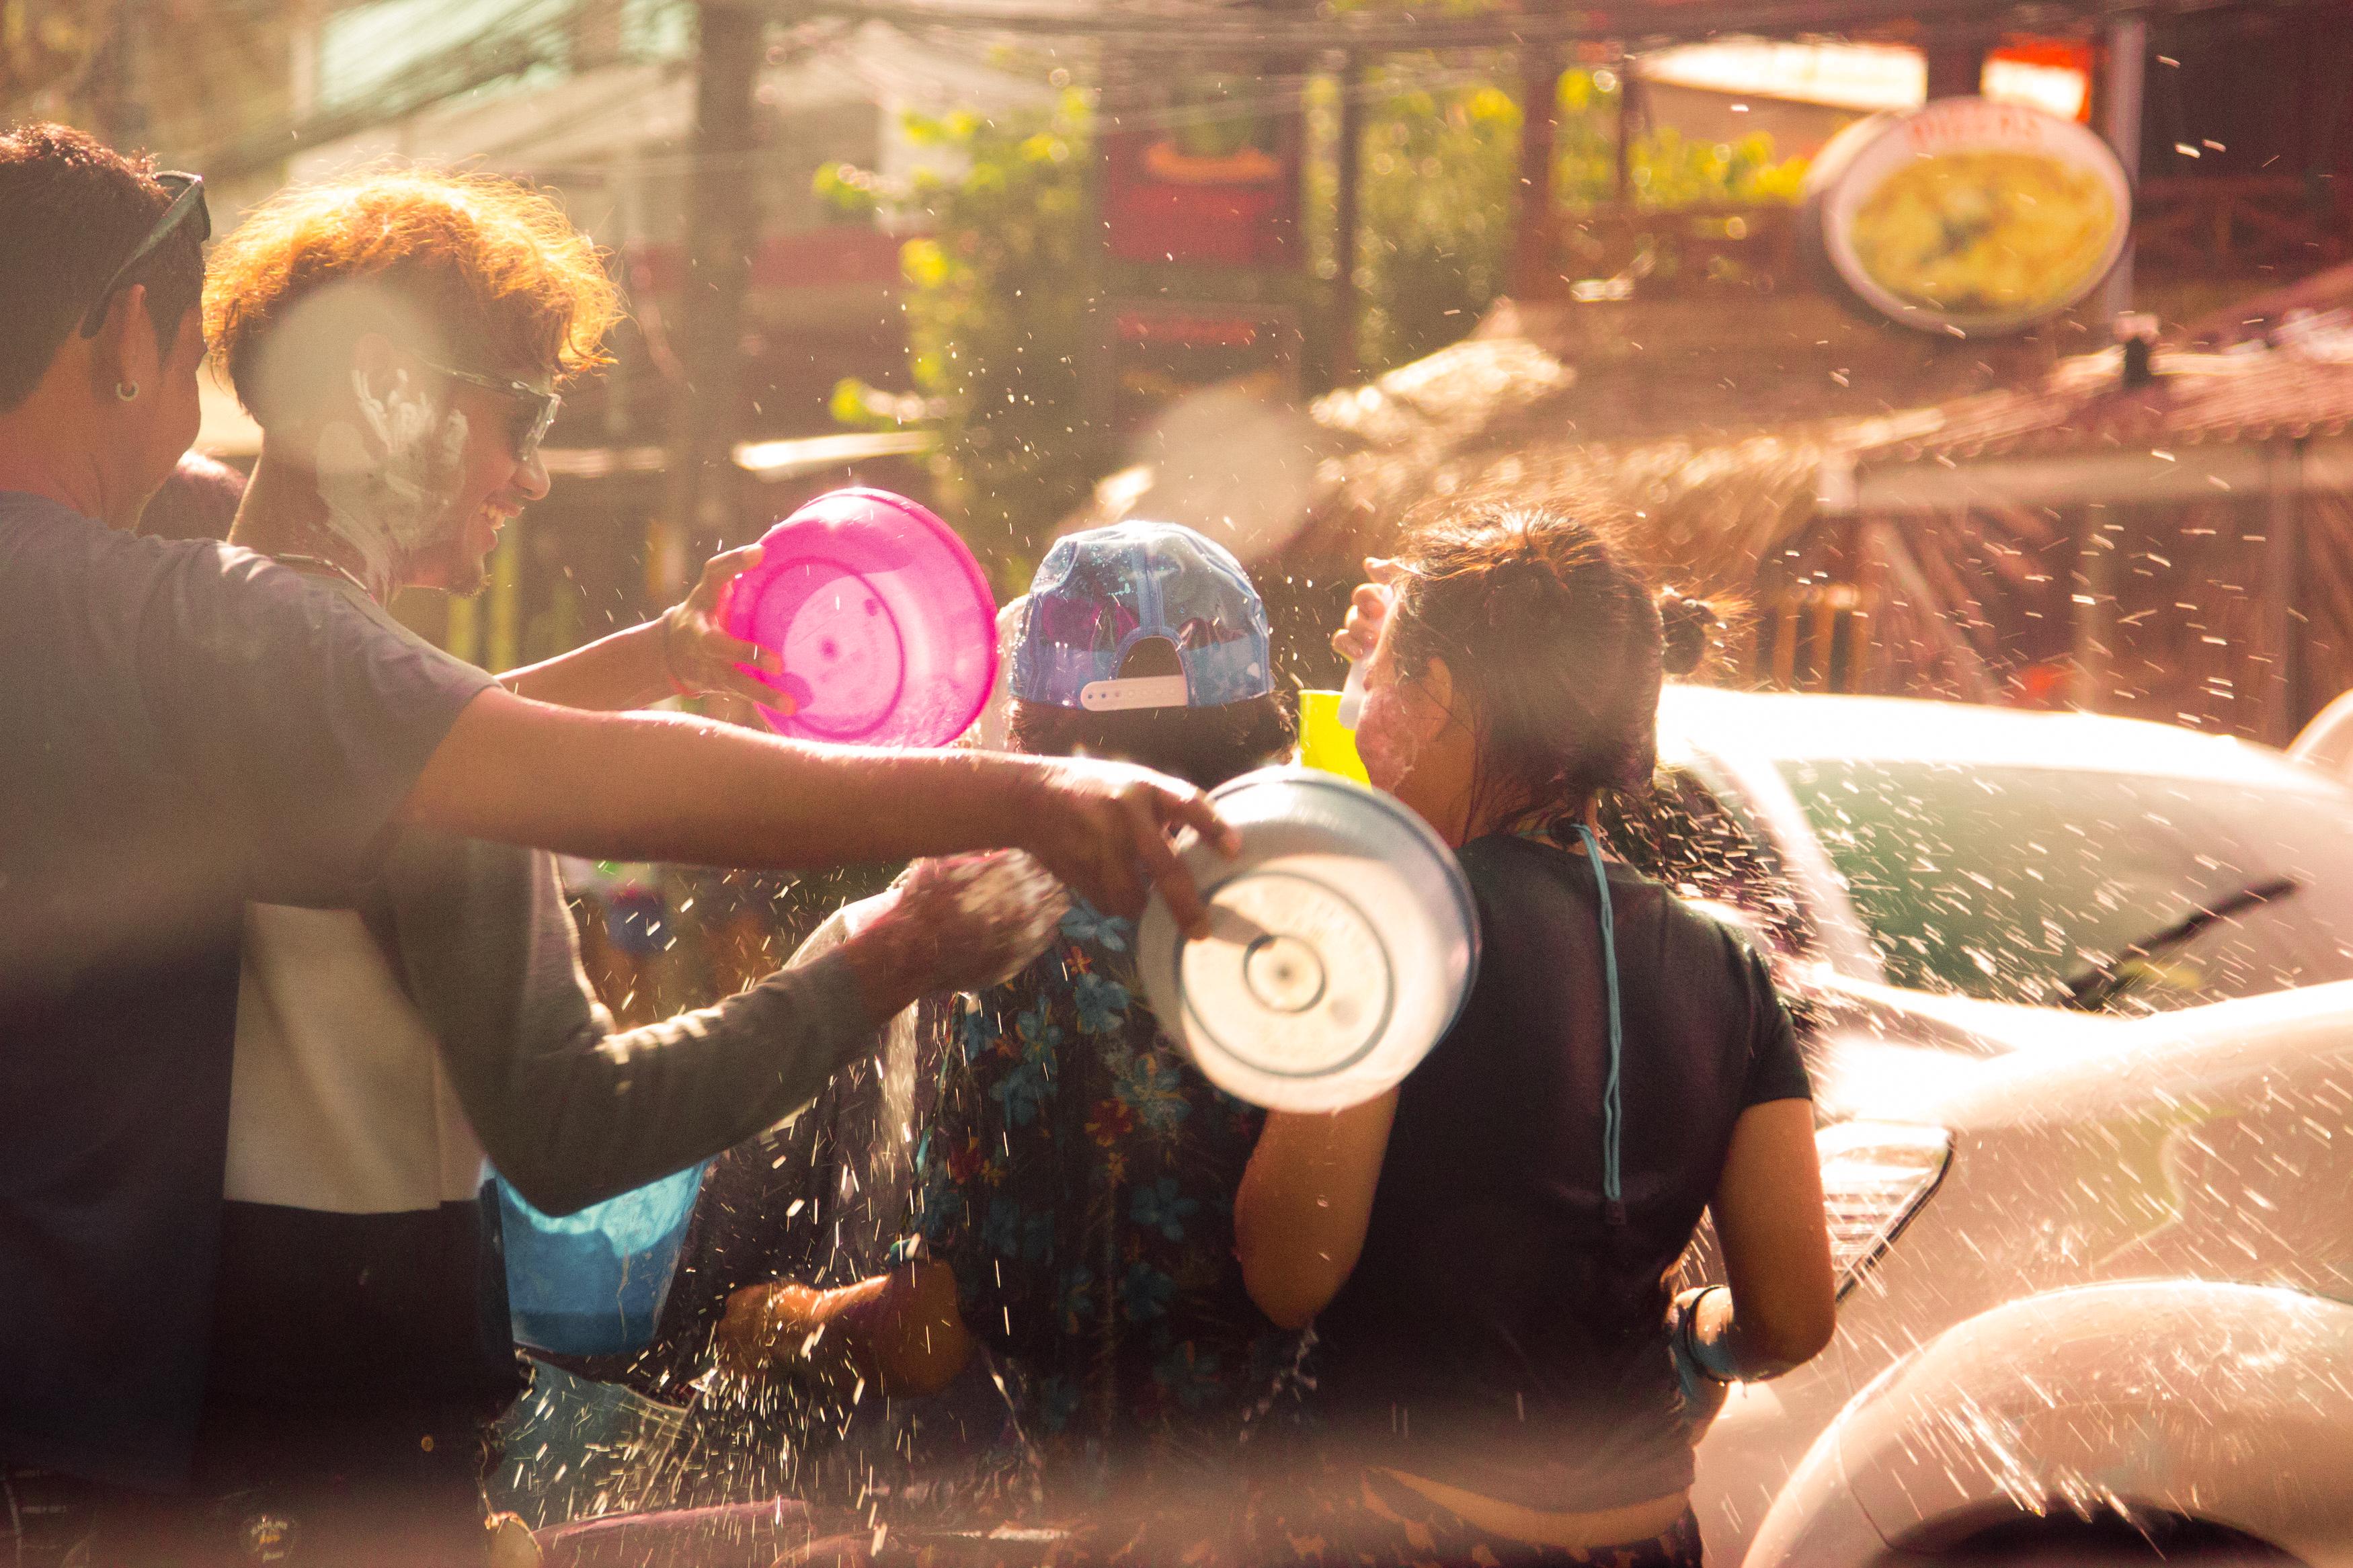 Таиланд одобрил перенос Сонгкрана и закрытие школ из-за коронавируса